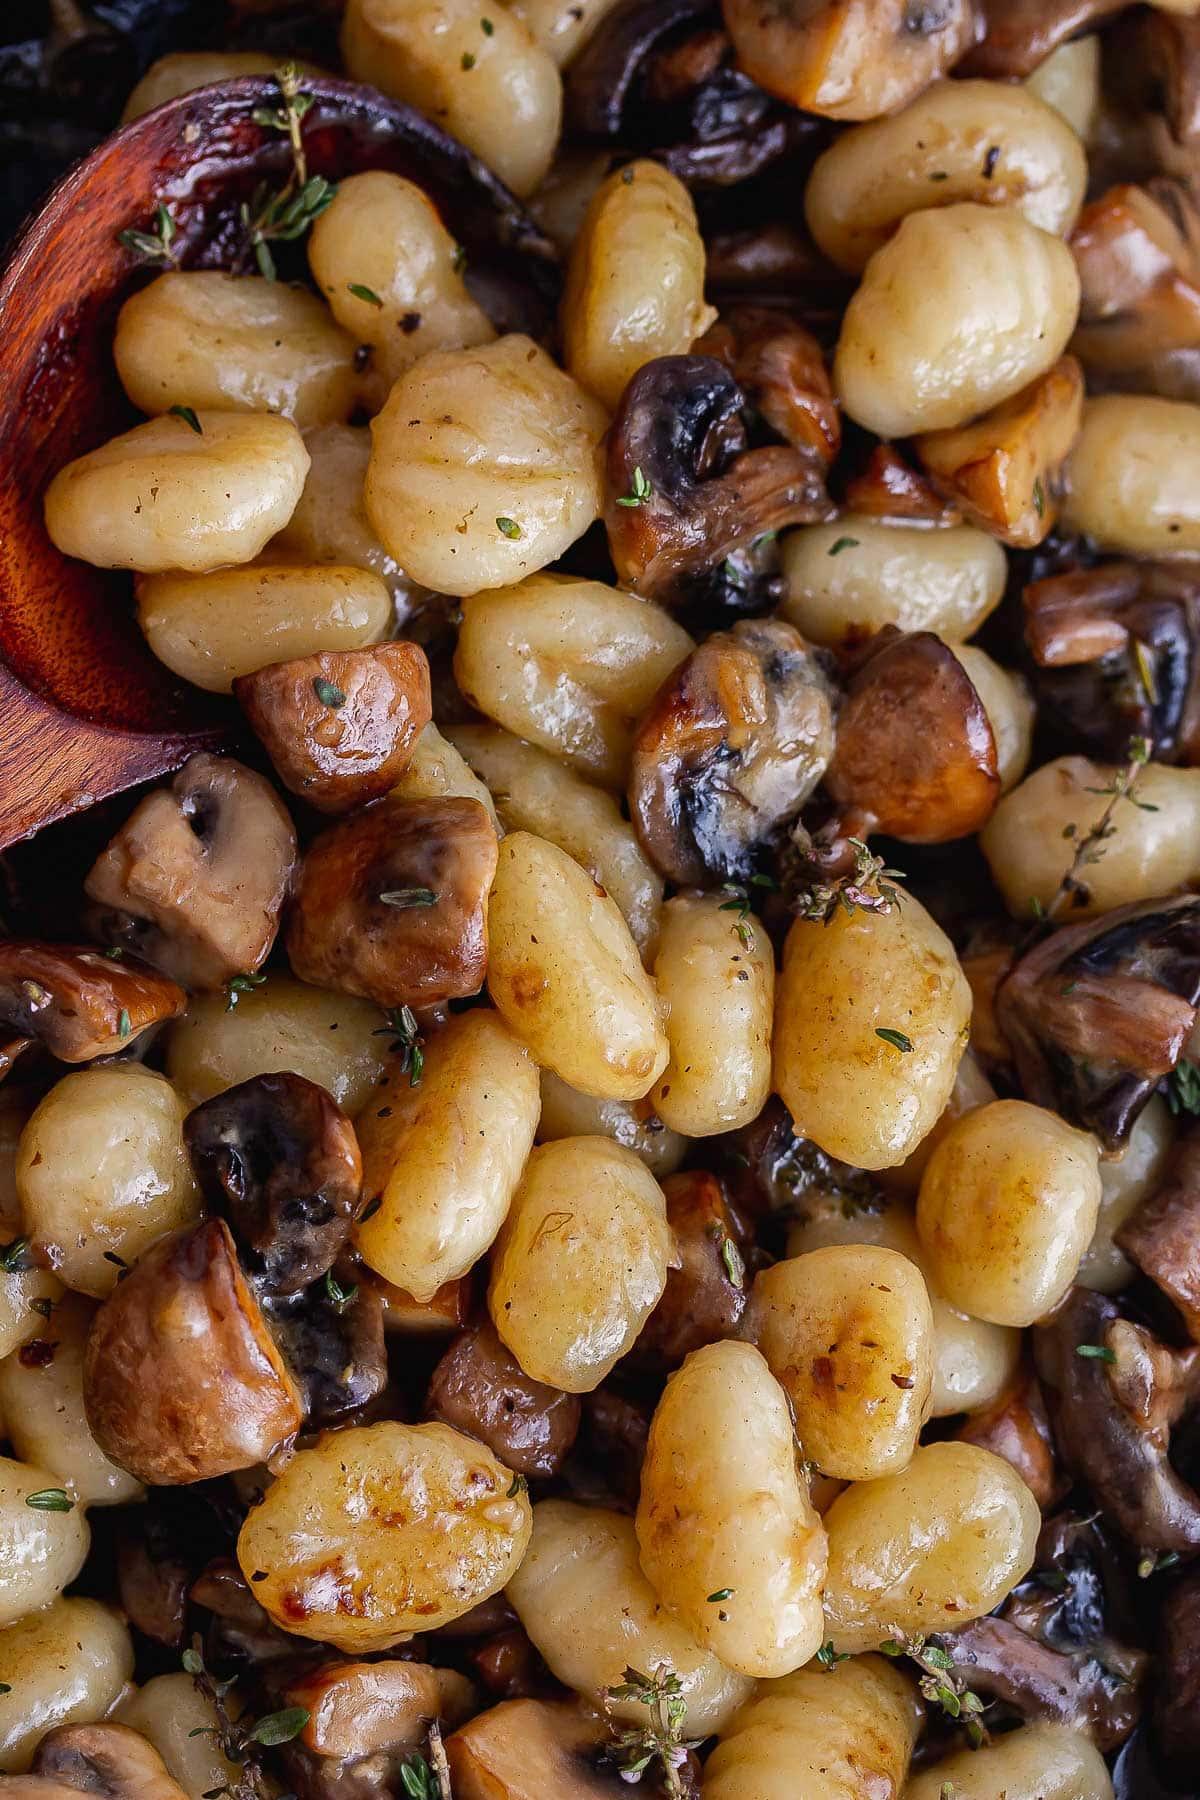 Overhead close up of gnocchi and mushrooms